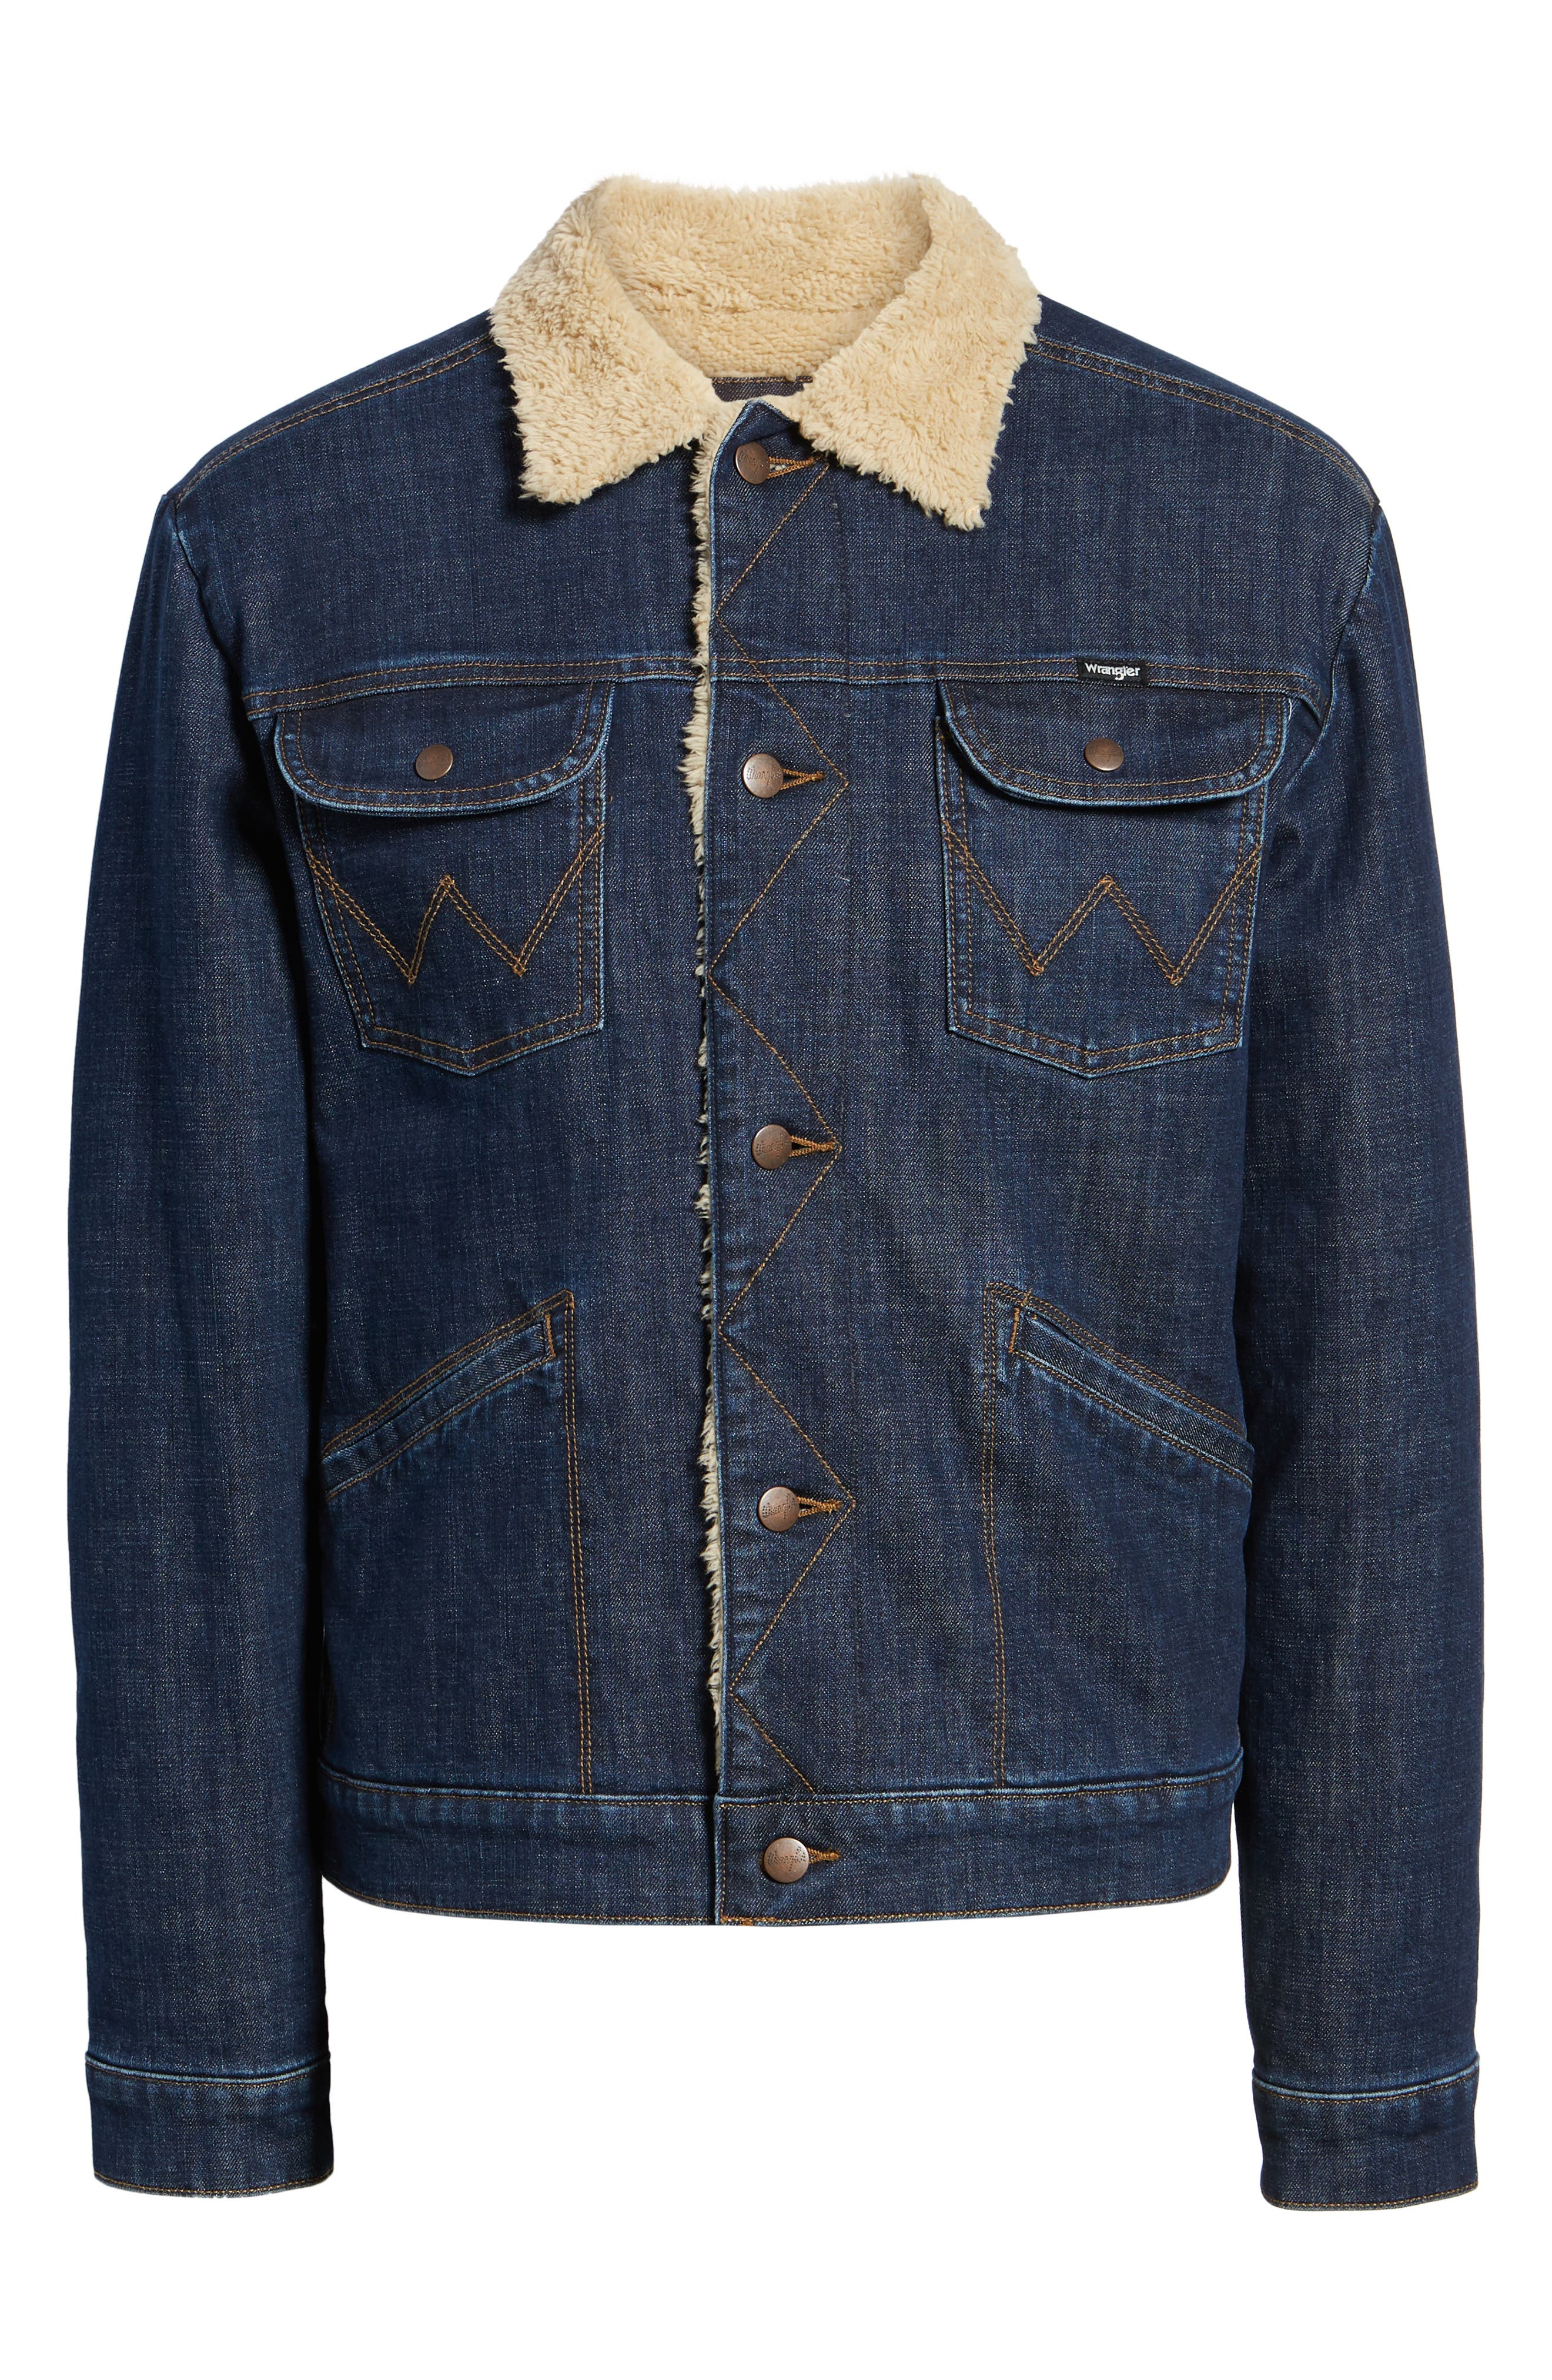 Heritage Fleece Lined Denim Jacket,                             Alternate thumbnail 6, color,                             DARK